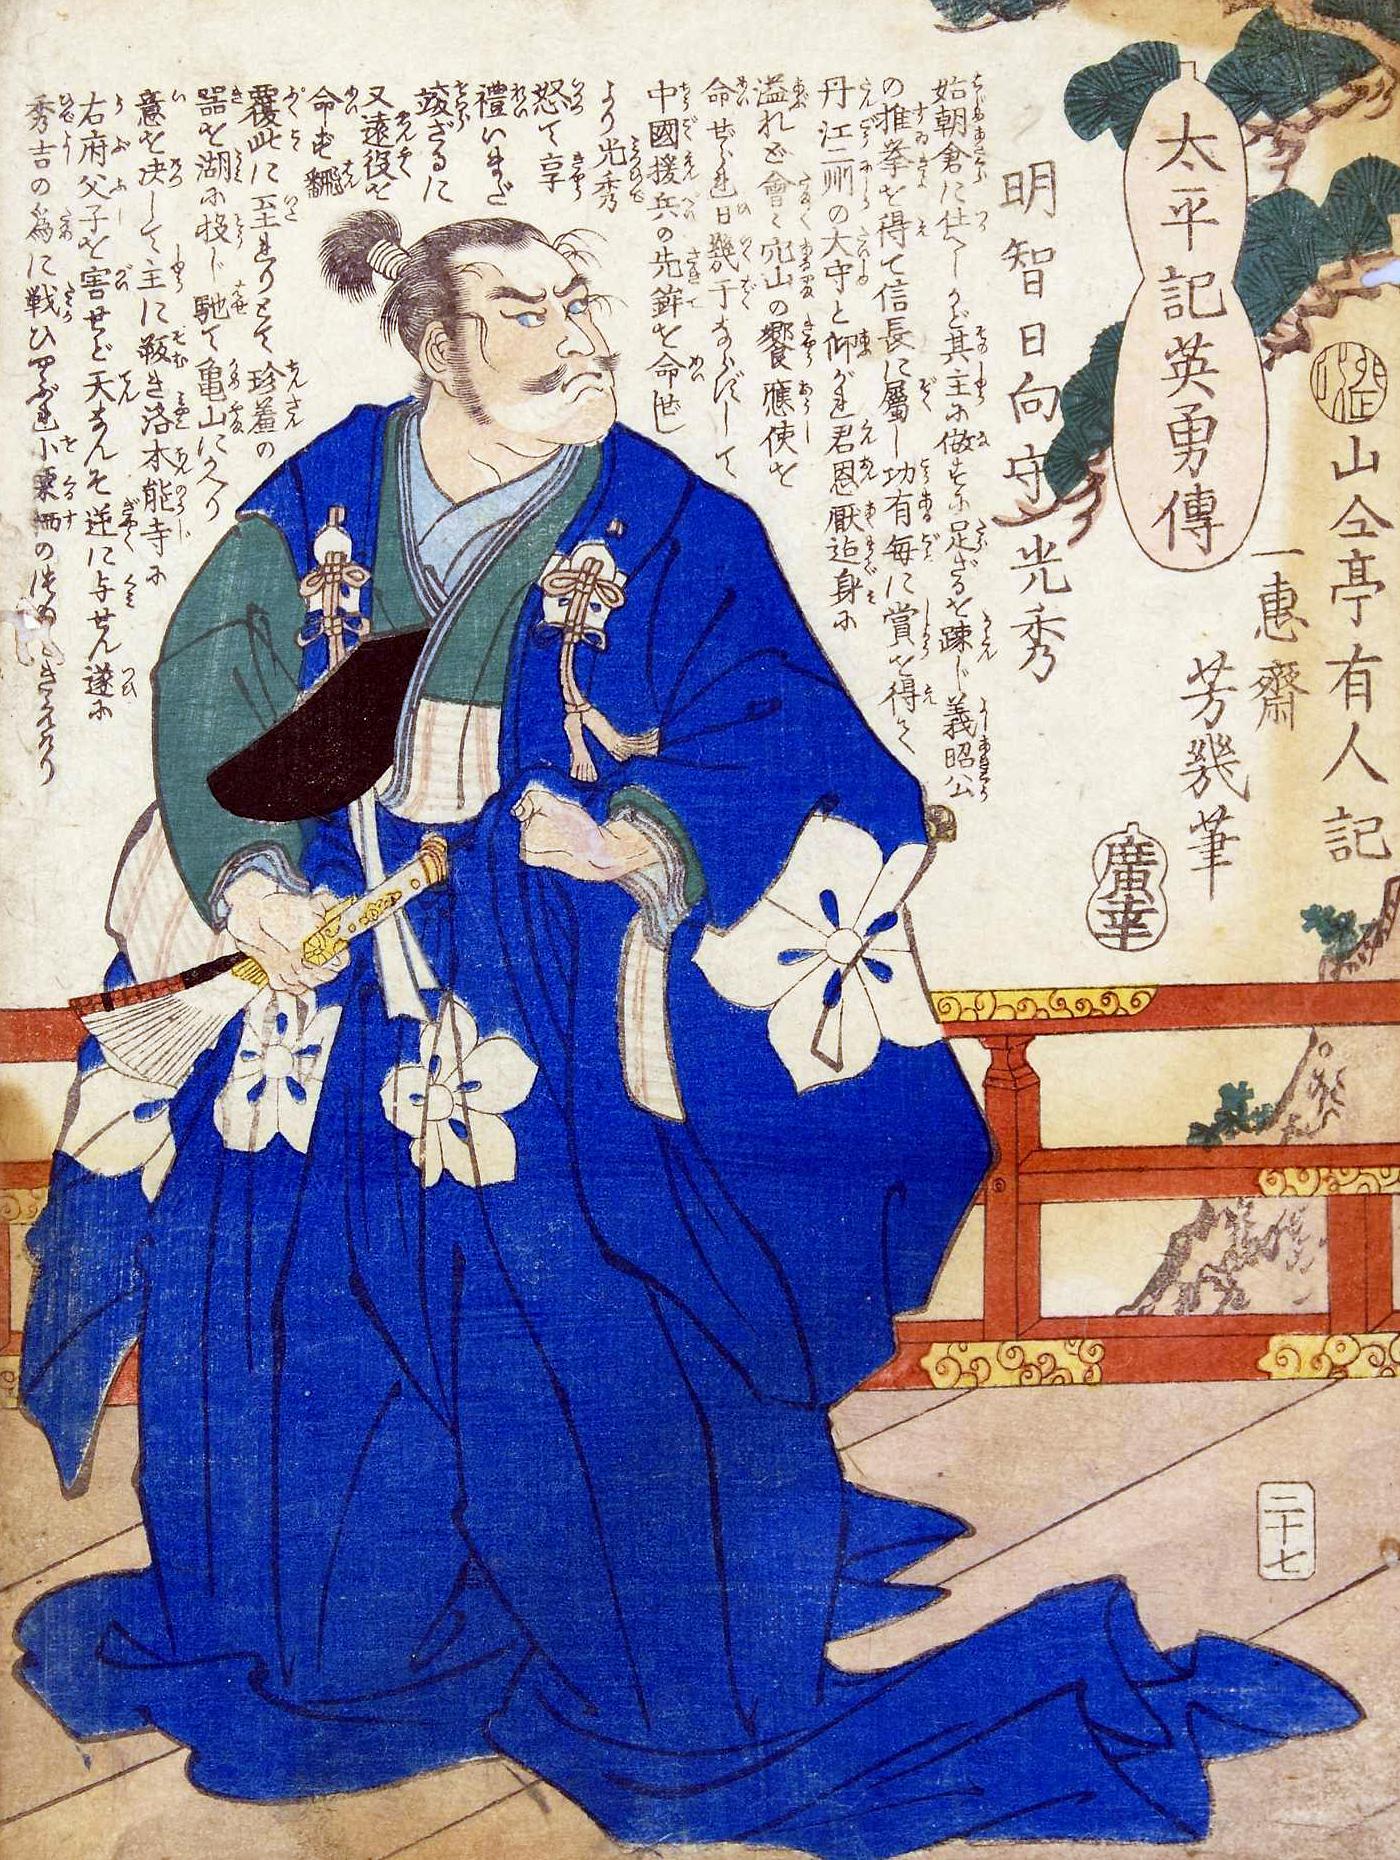 File:Akechi Mitsuhide 5.jpg - Wikimedia Commons